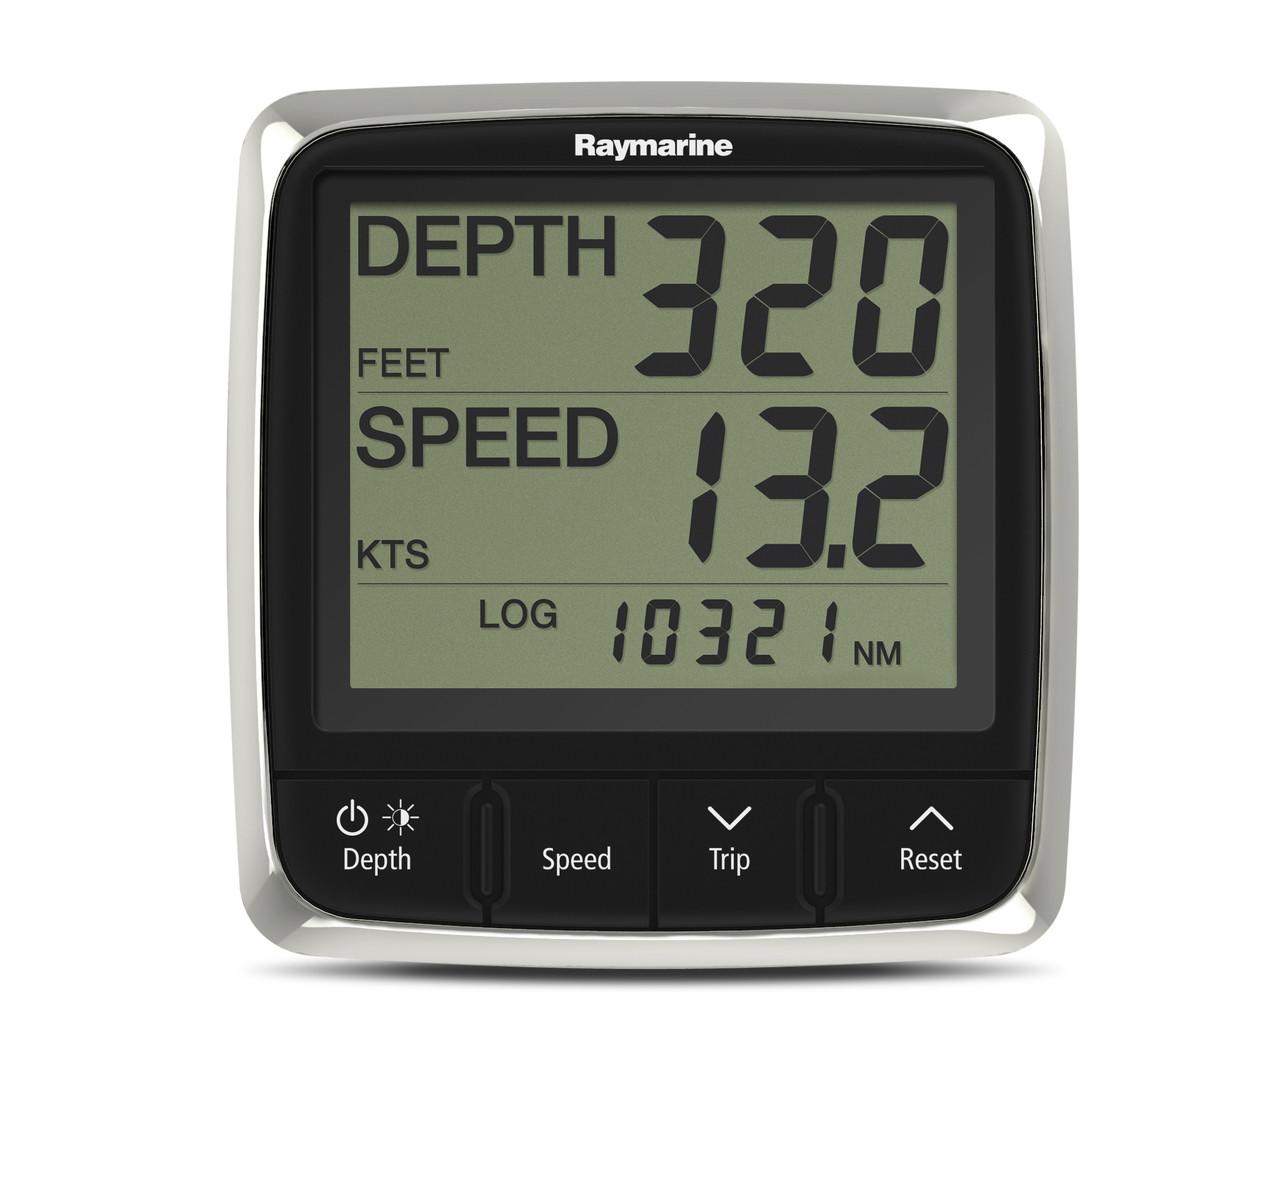 Raymarine i50 Tridata Instrument Display Front View